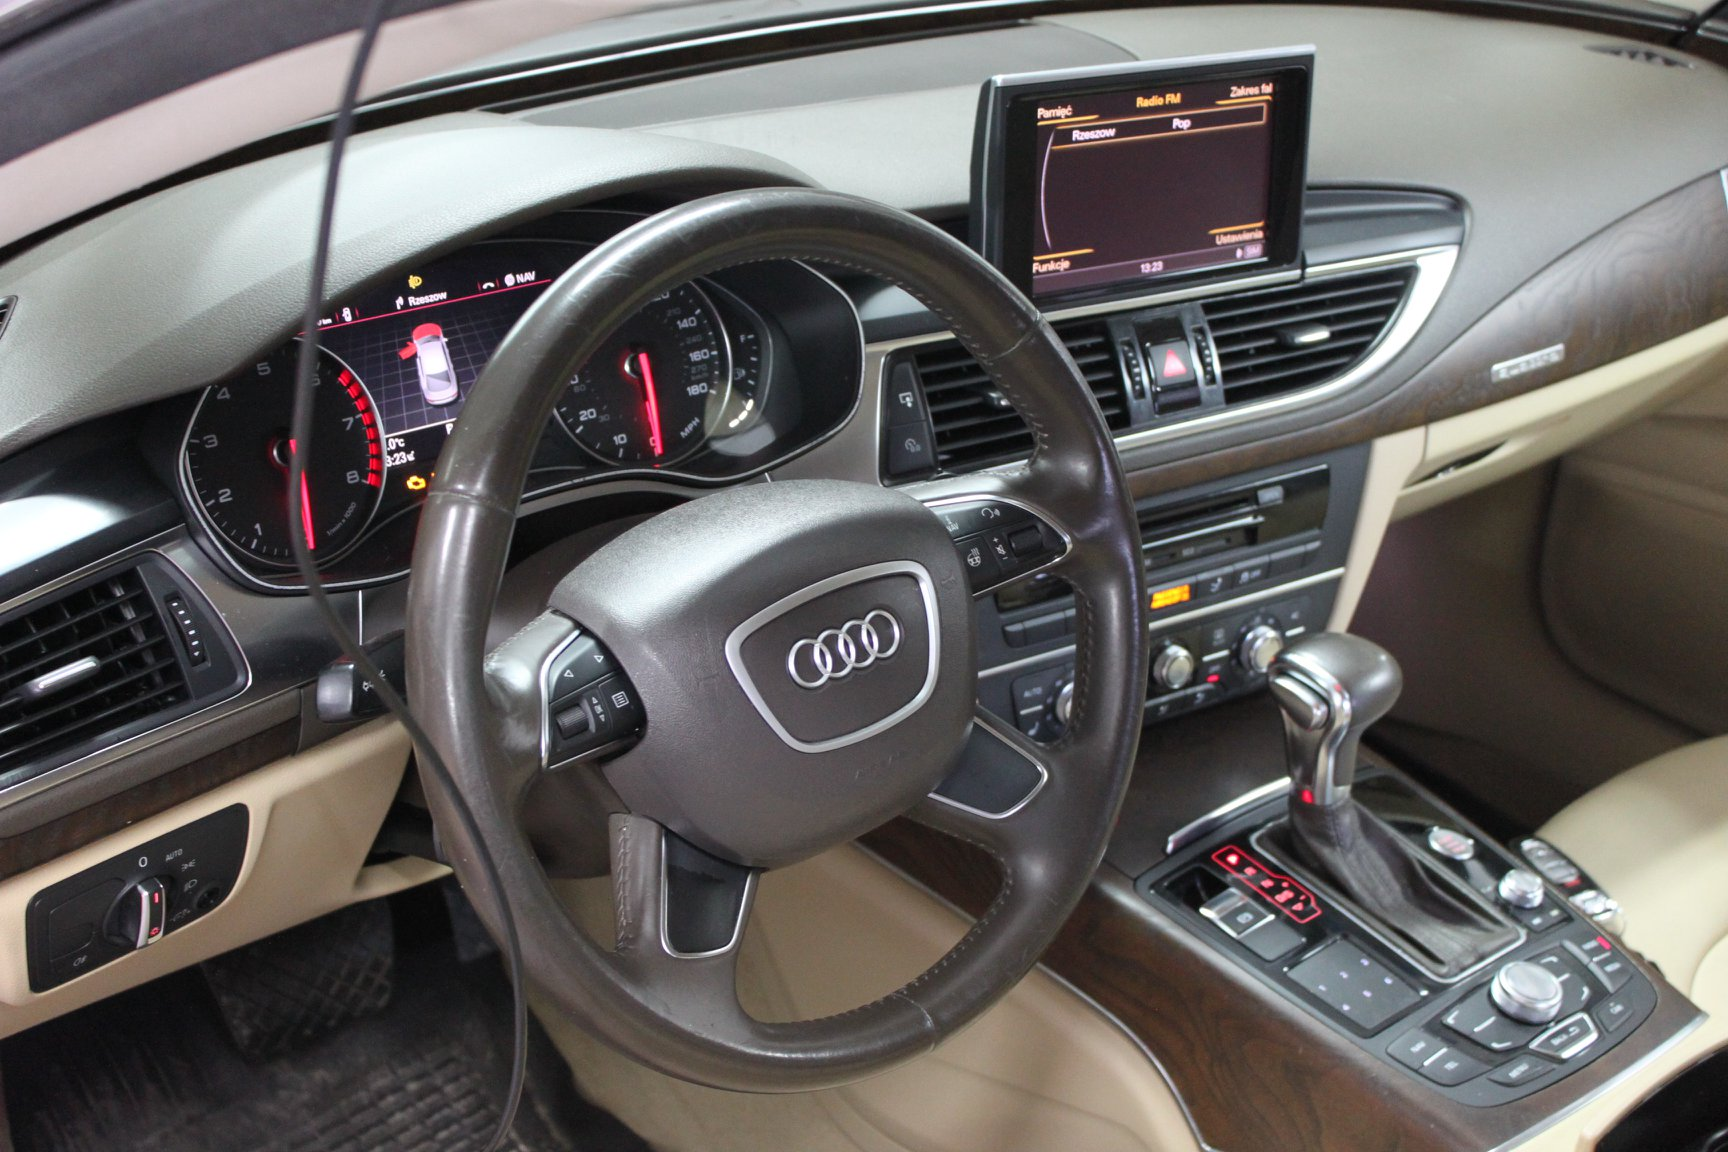 AUDI A7 3.0 TFSI QUATTRO 2012